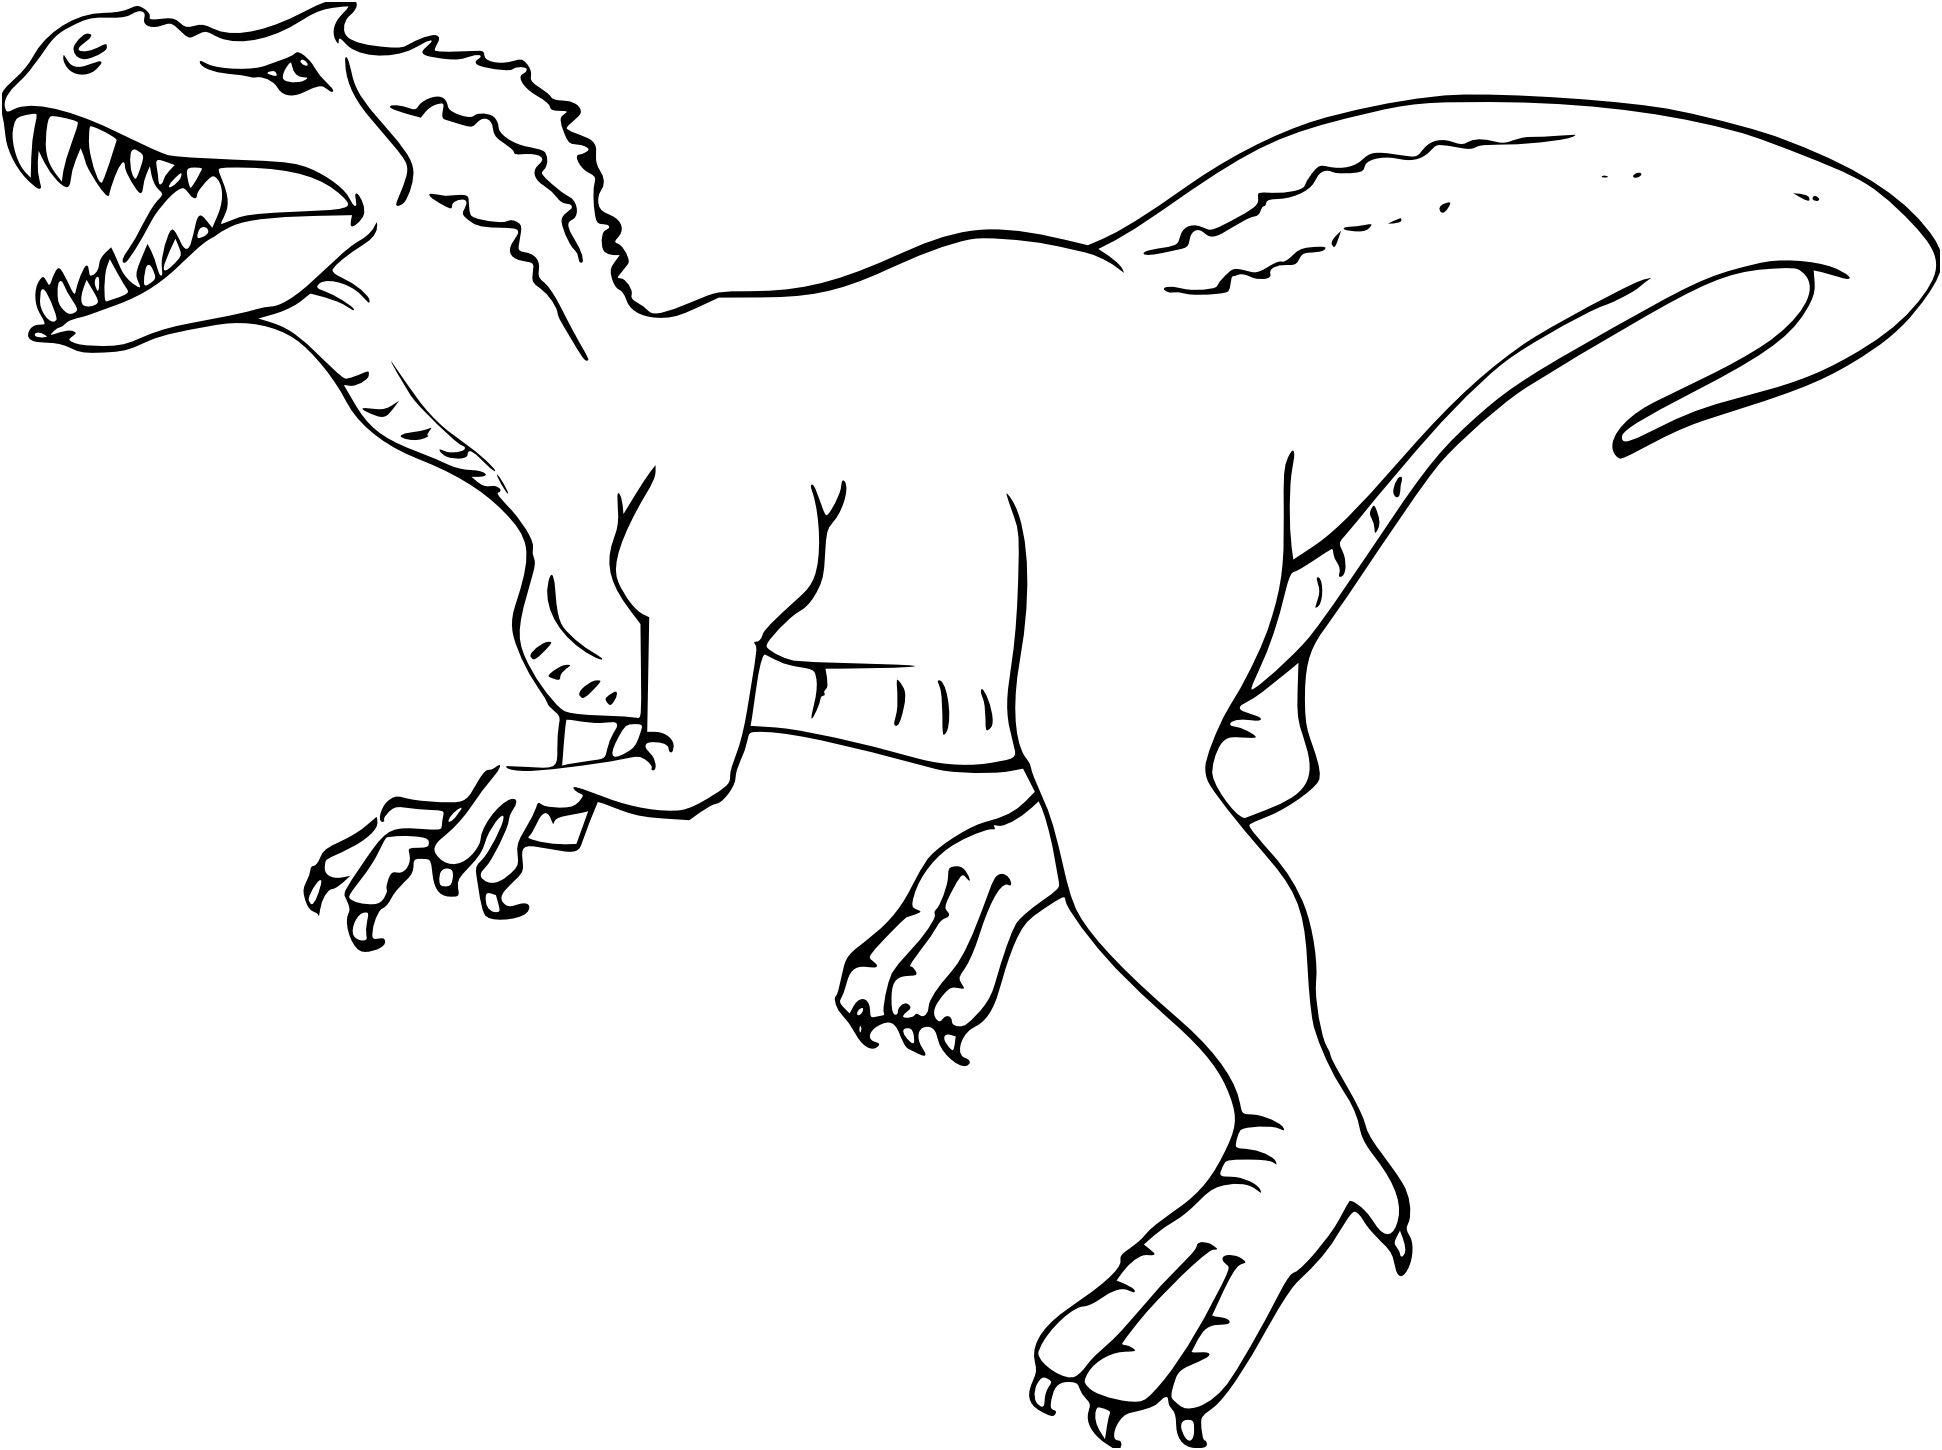 Impressionnant Dessin A Imprimer Dinosaure Tyrex avec Coloriage Dinosaure Imprimer